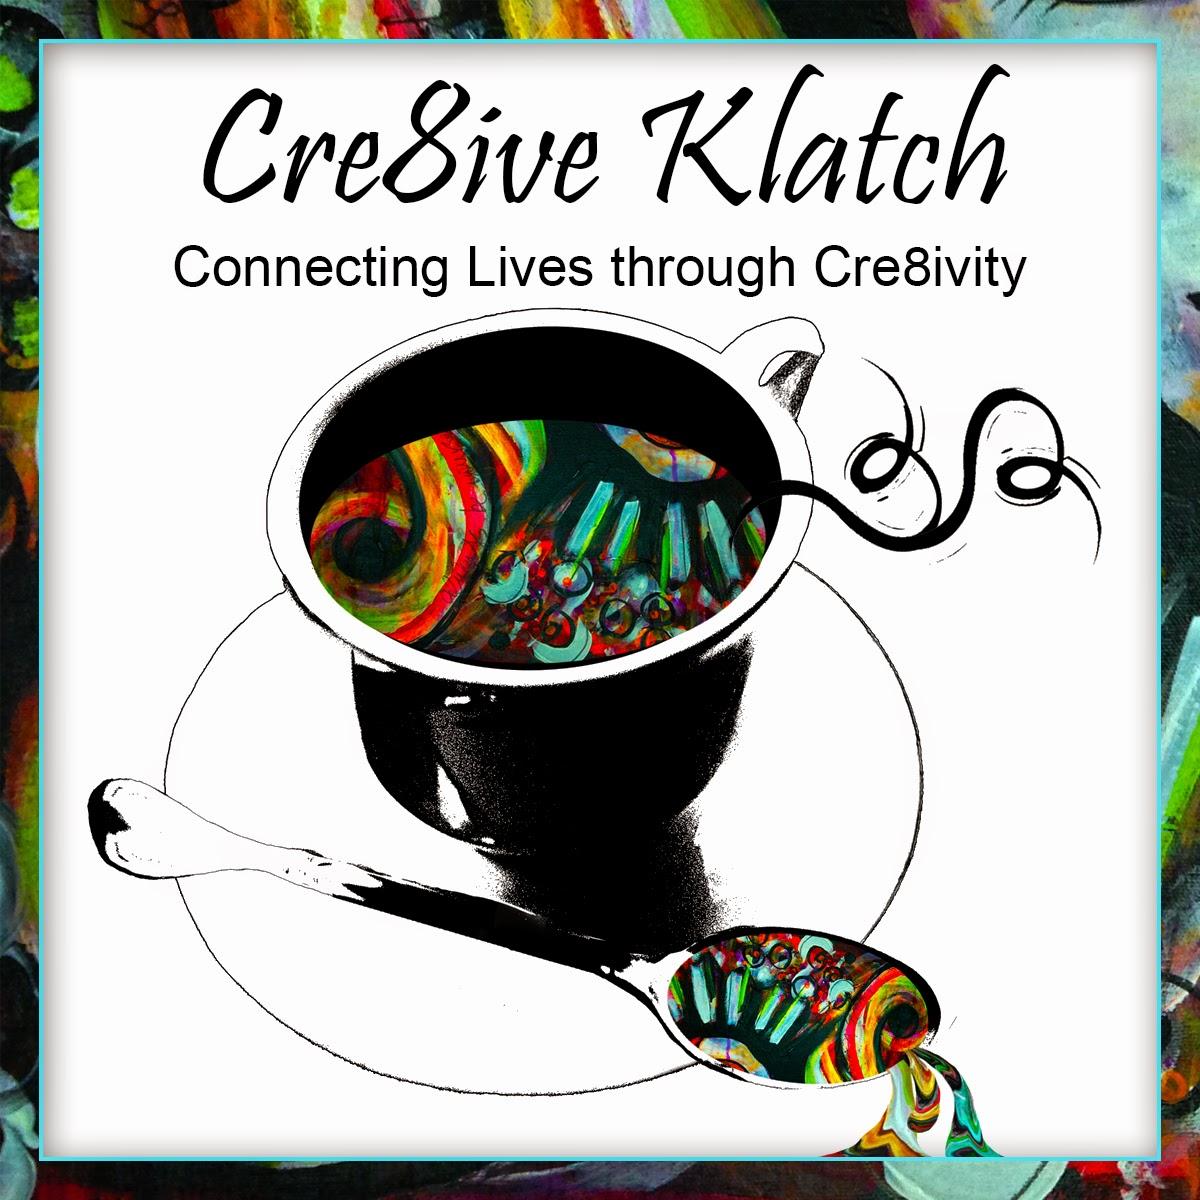 Cre8tive Klatch Blog